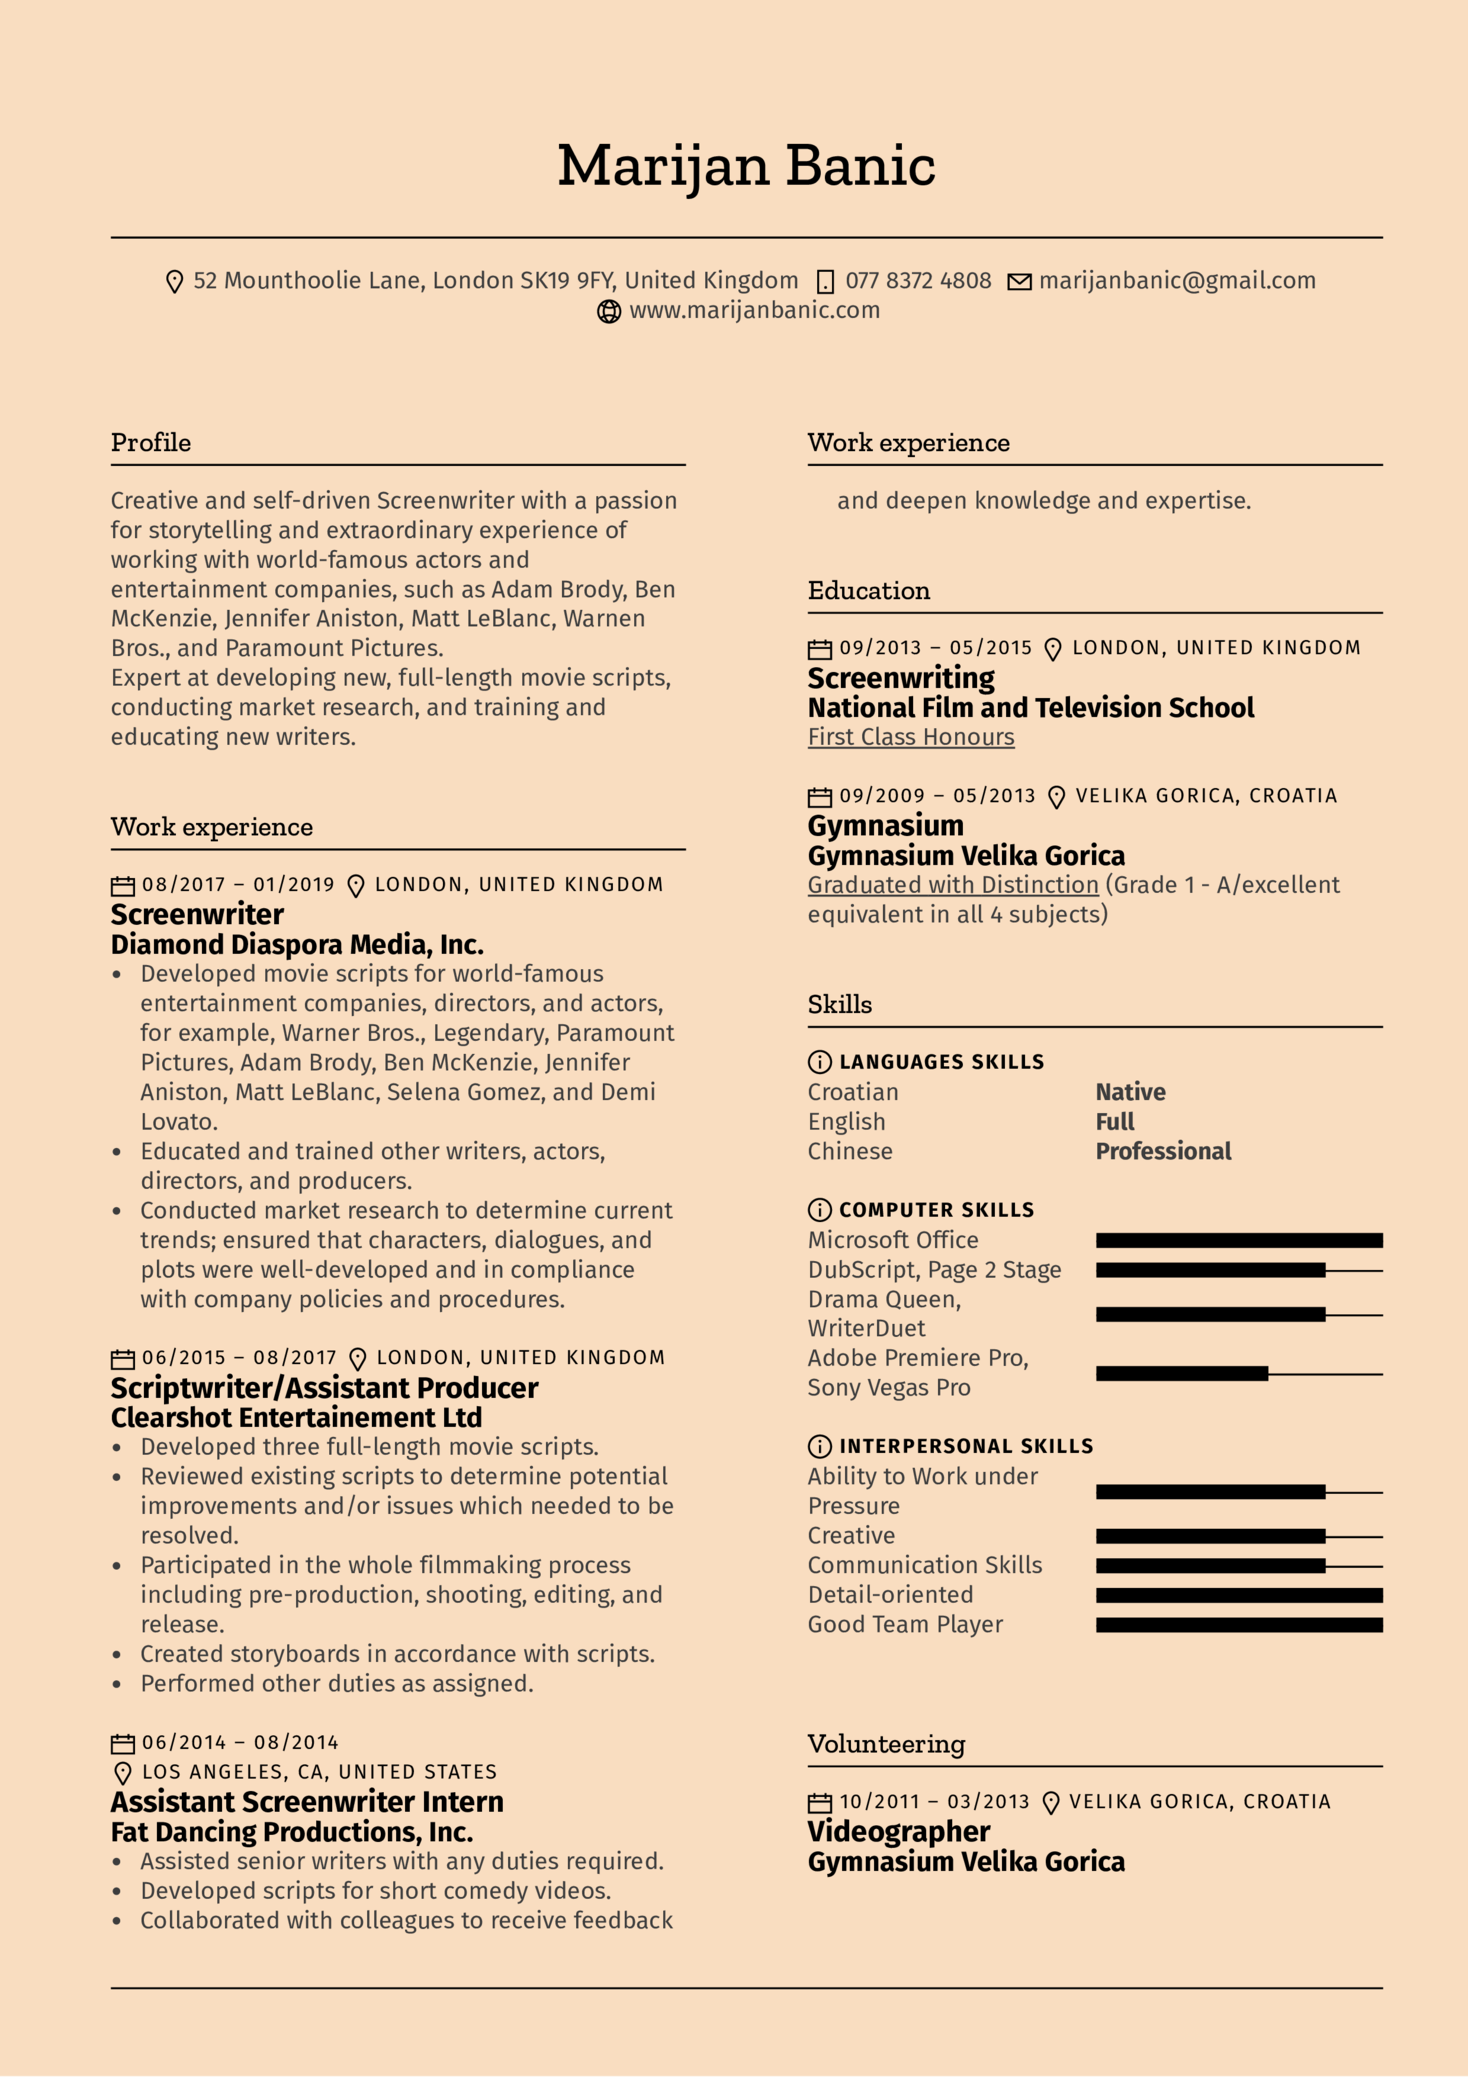 Screenwriter Resume Template (Parte 1)